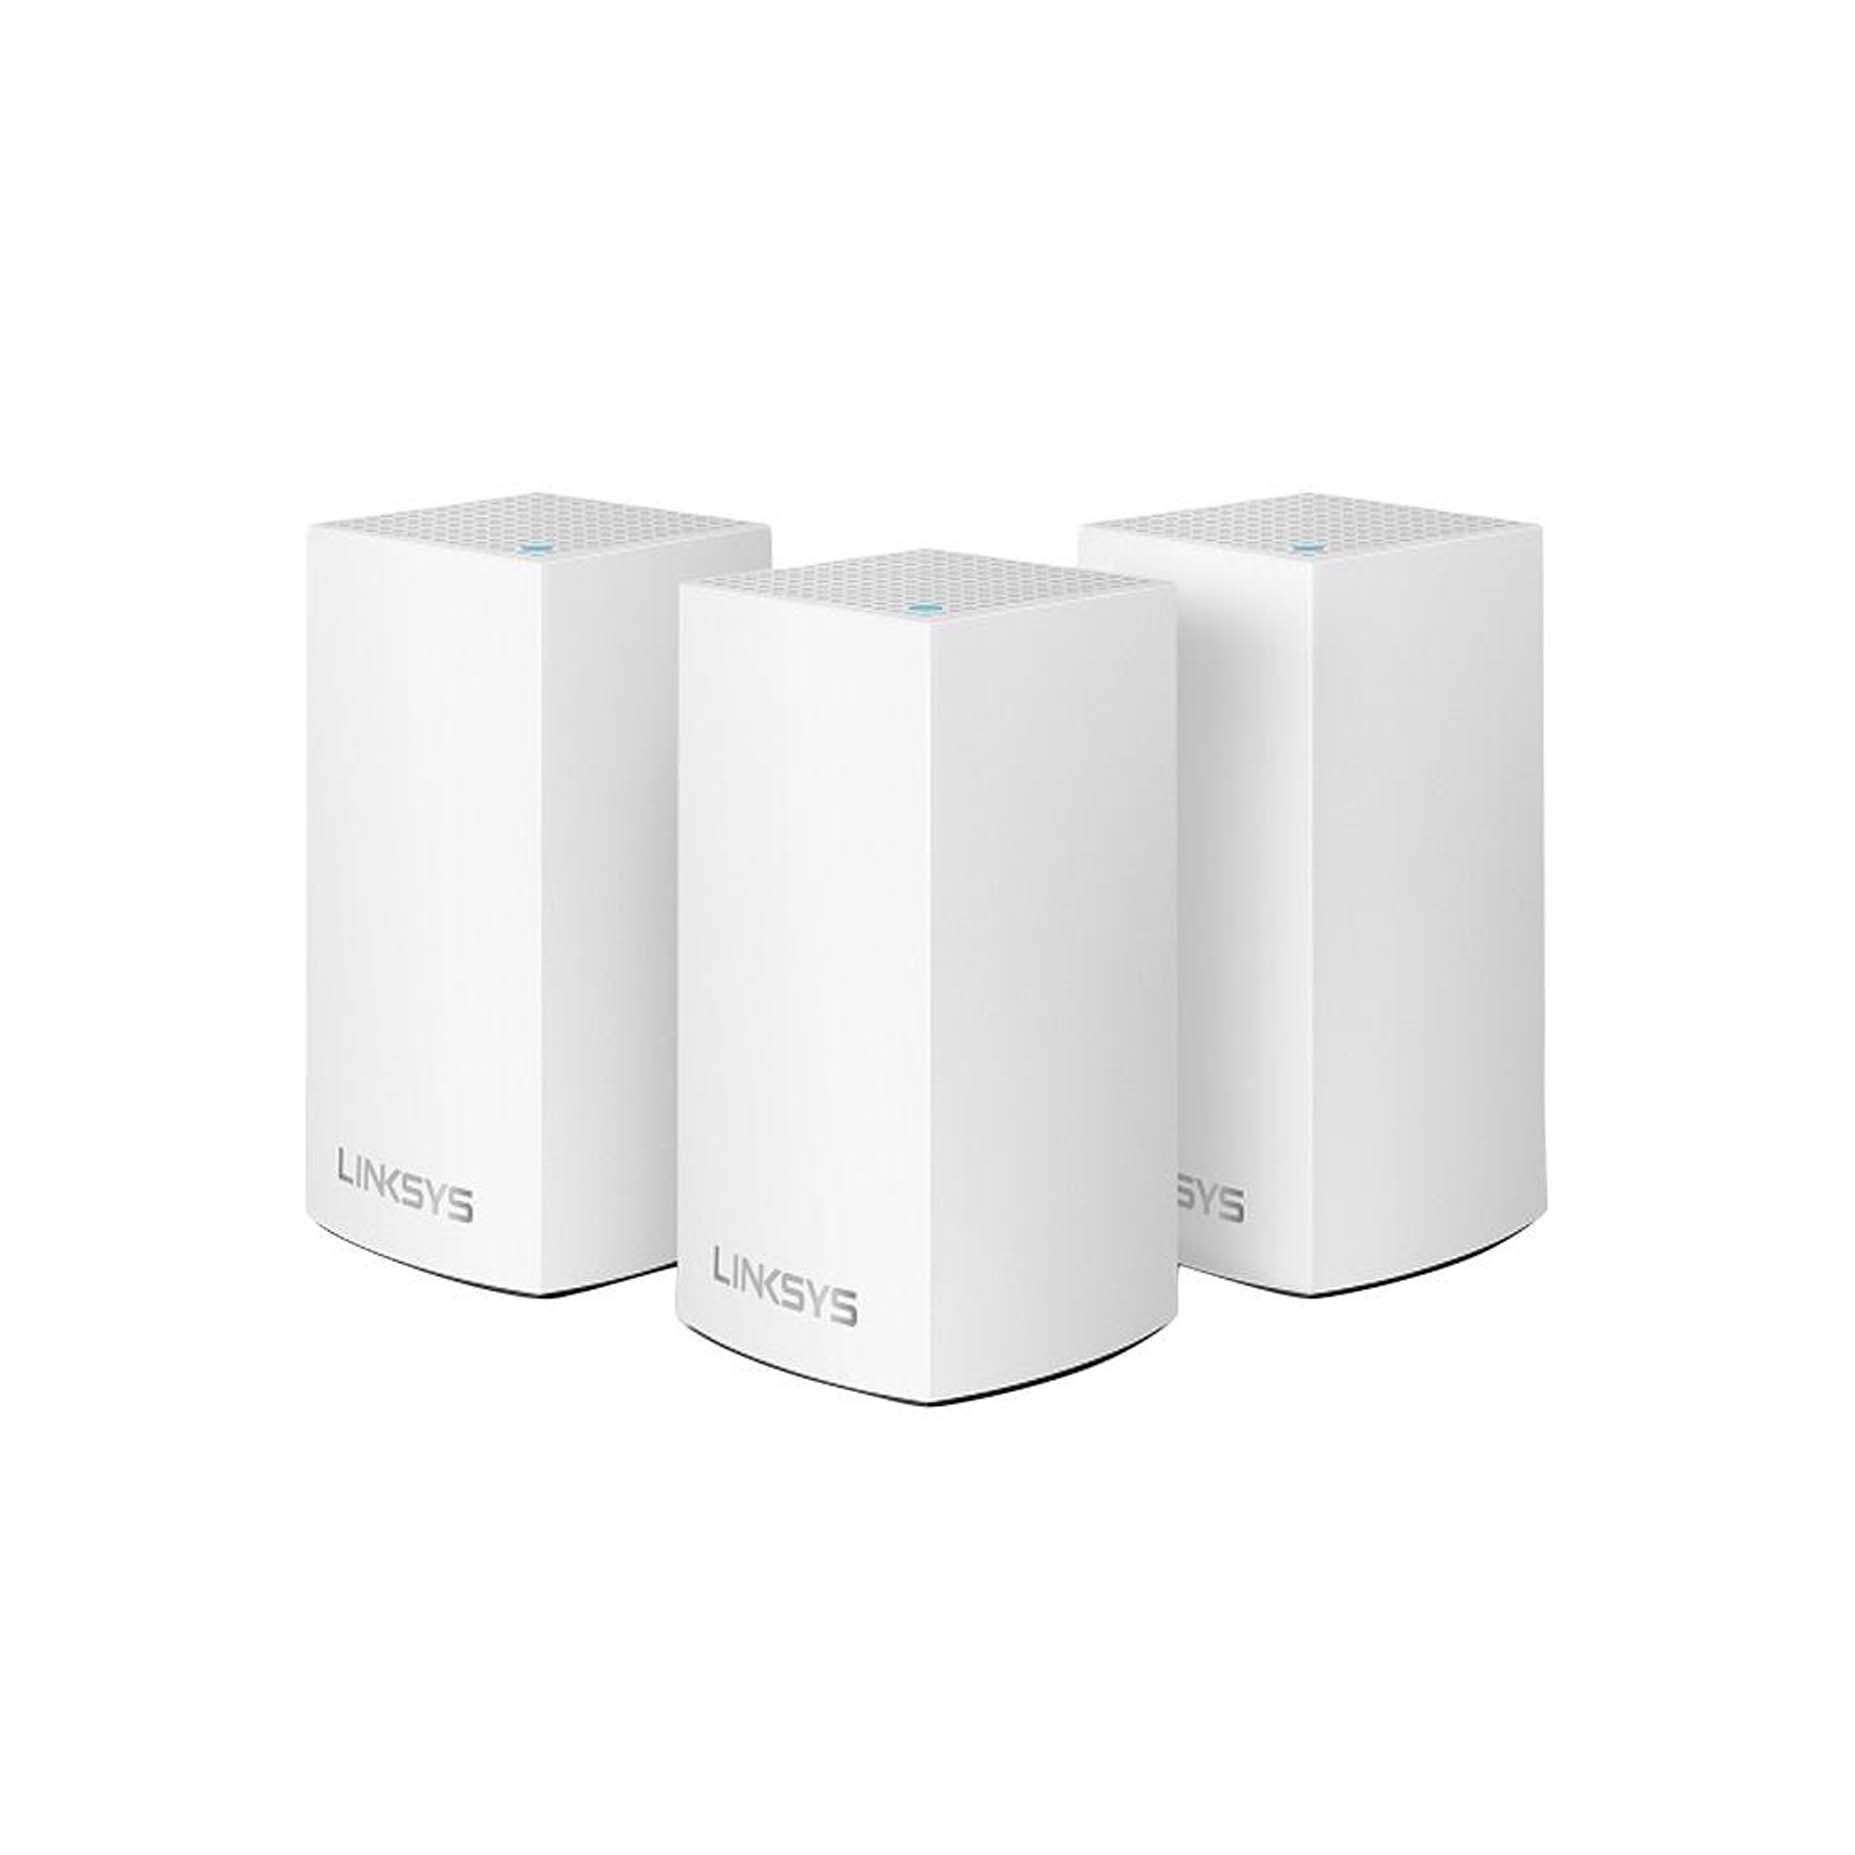 Harga Jual Linksys WHW0103-AH Velop Intelligent Mesh WiFi System 3-Pack White (AC3900)